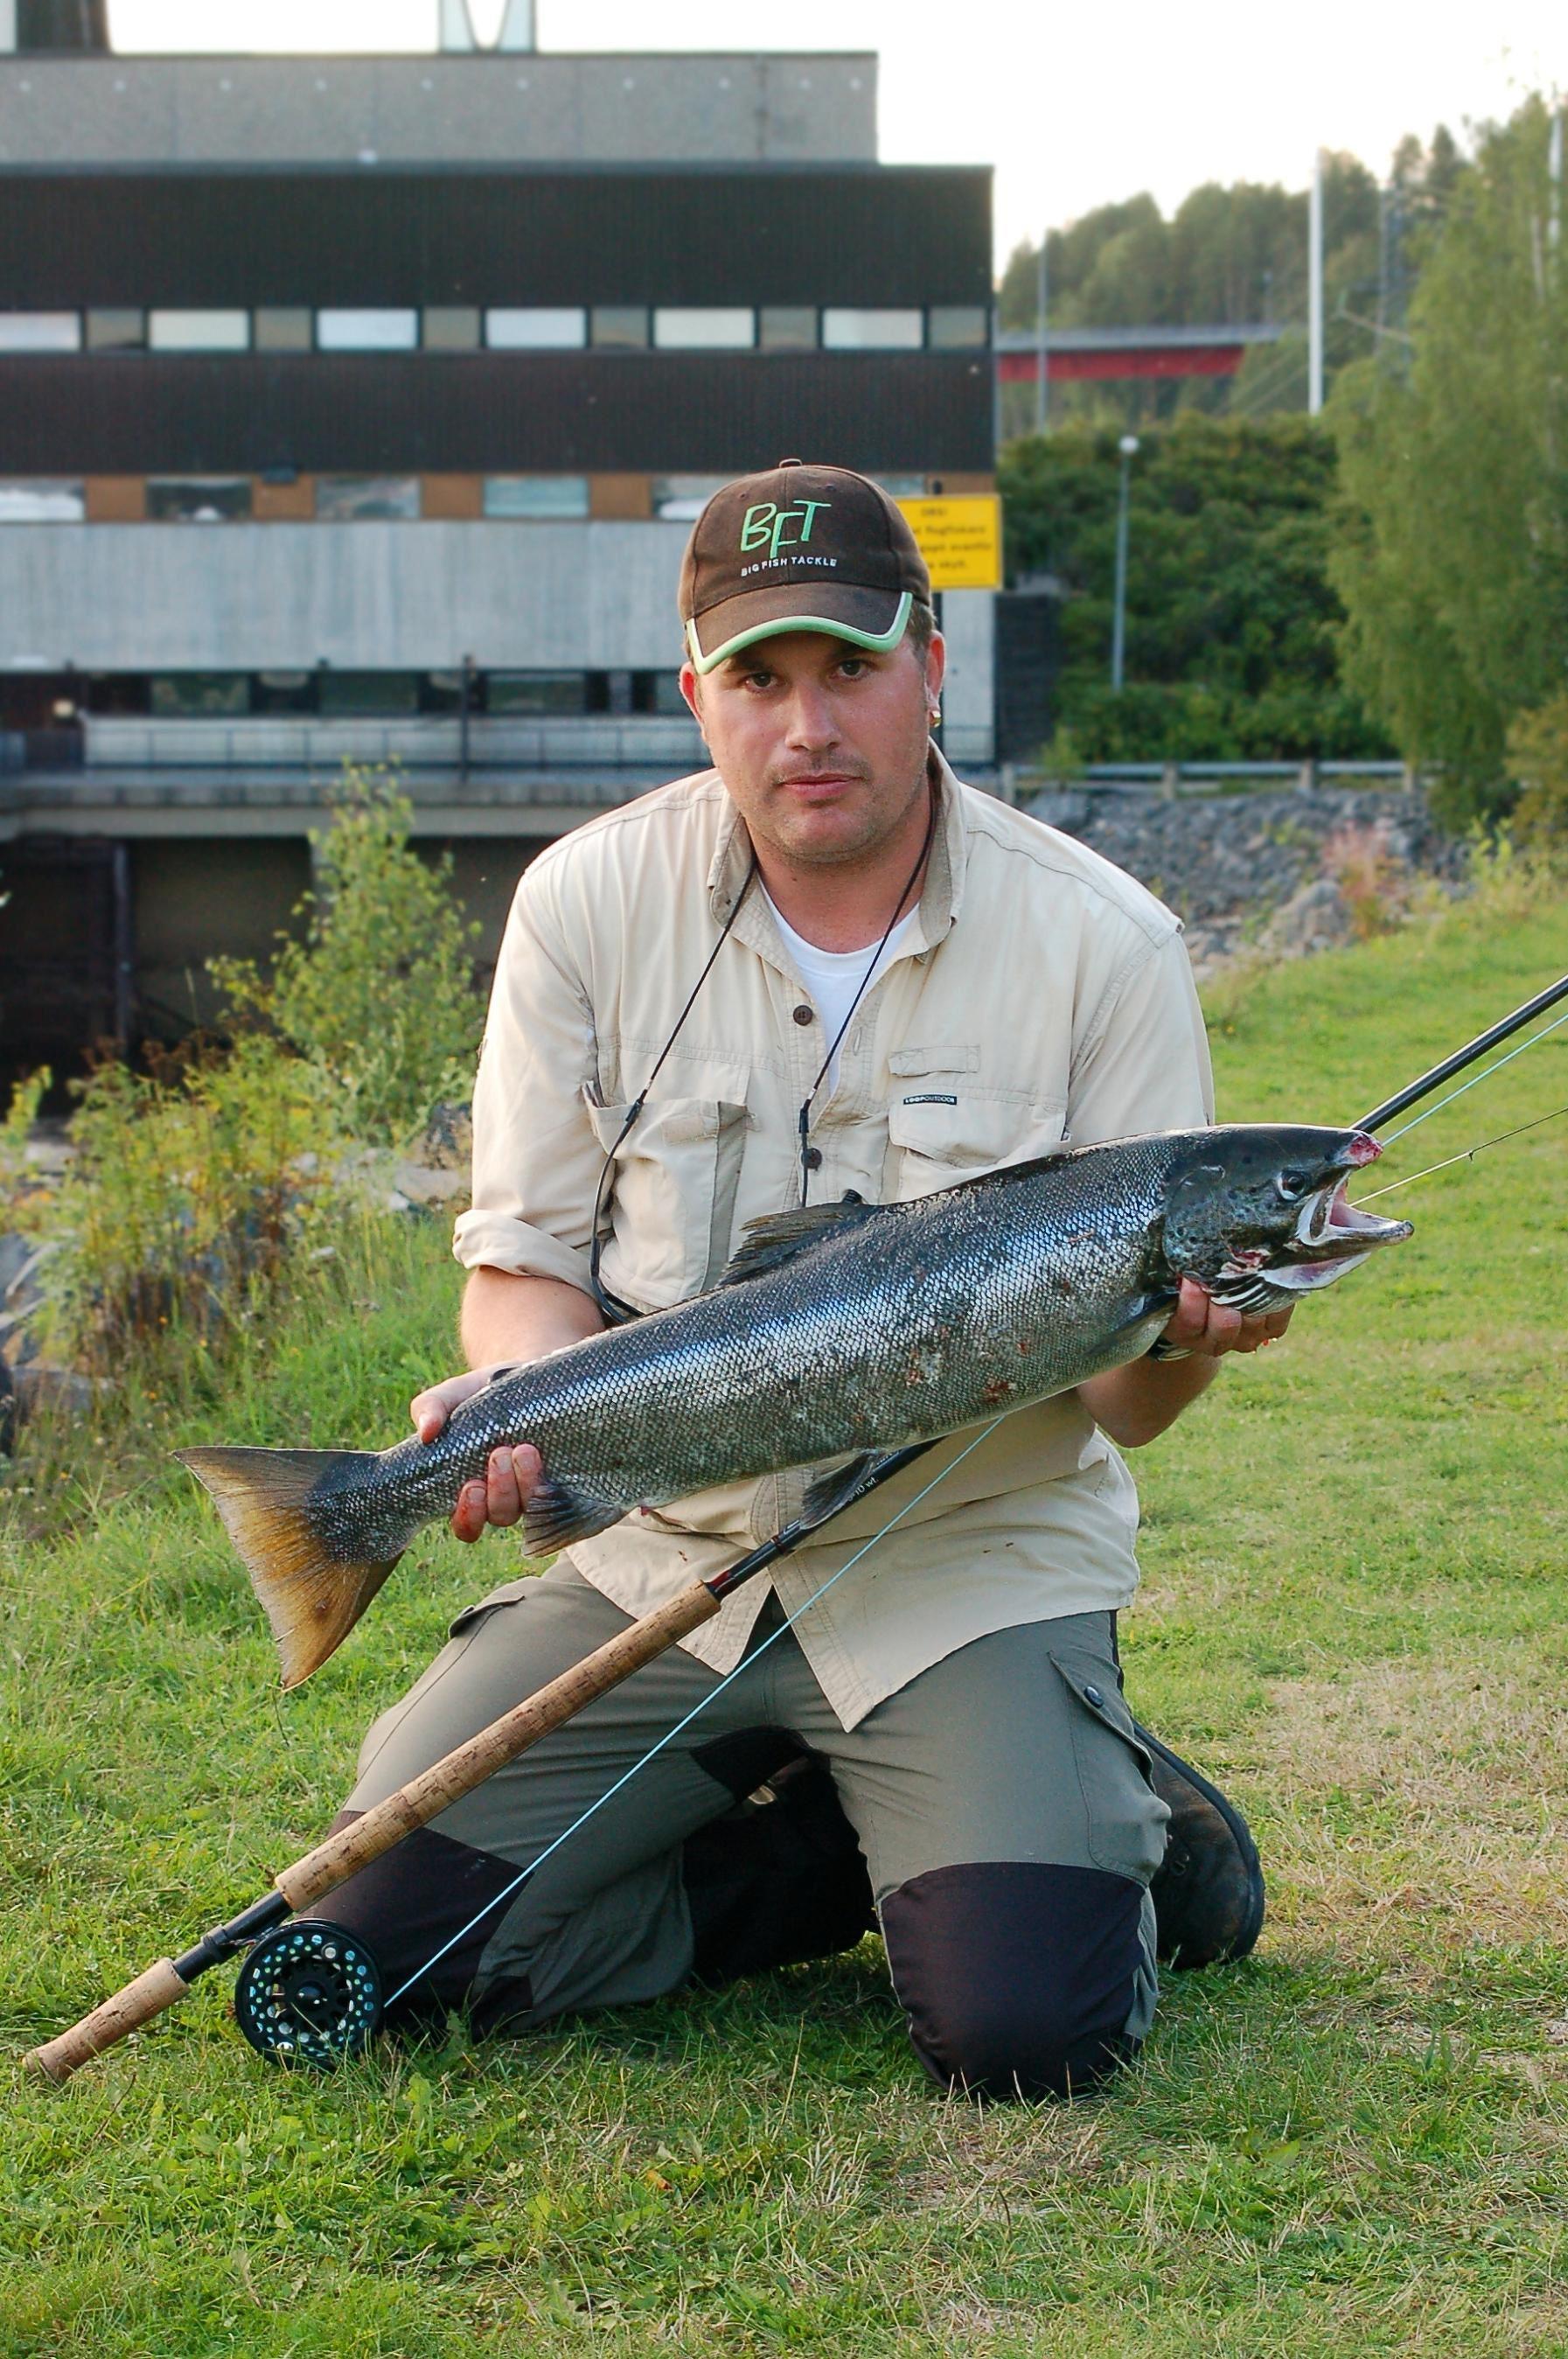 Foto: Media Lupus, Fångad lax vid Nipstadsfisket